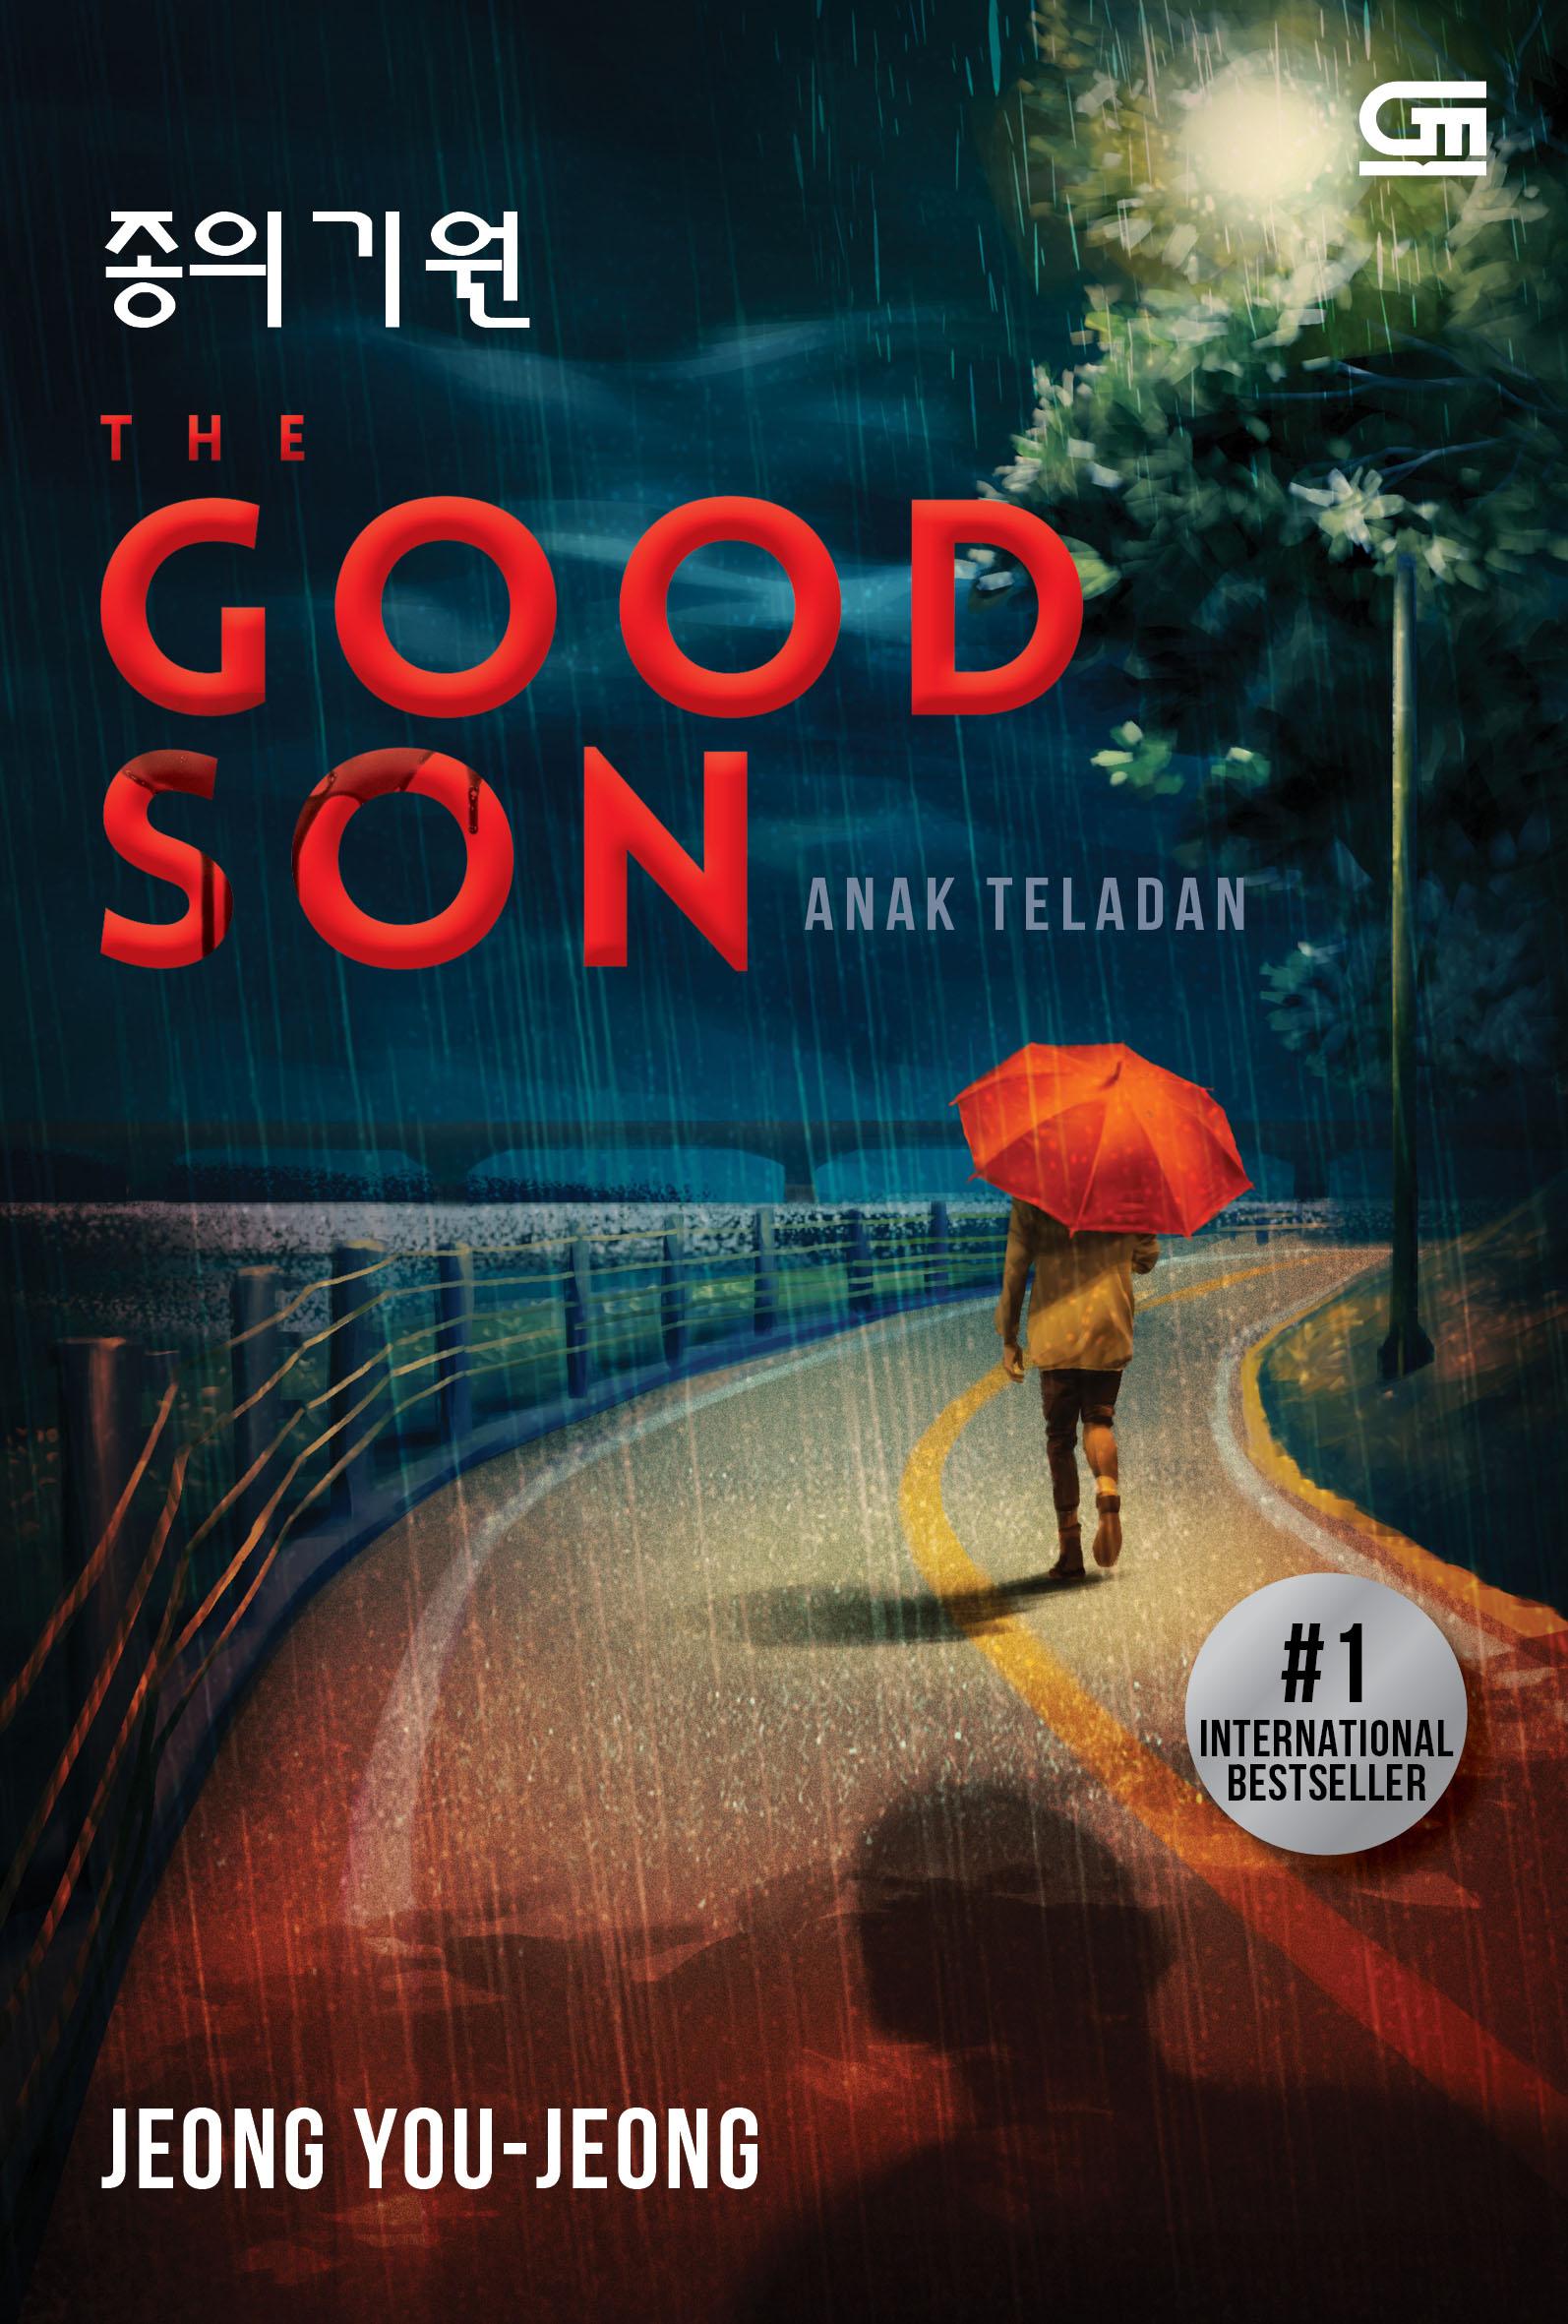 Anak Teladan (The Good Son)